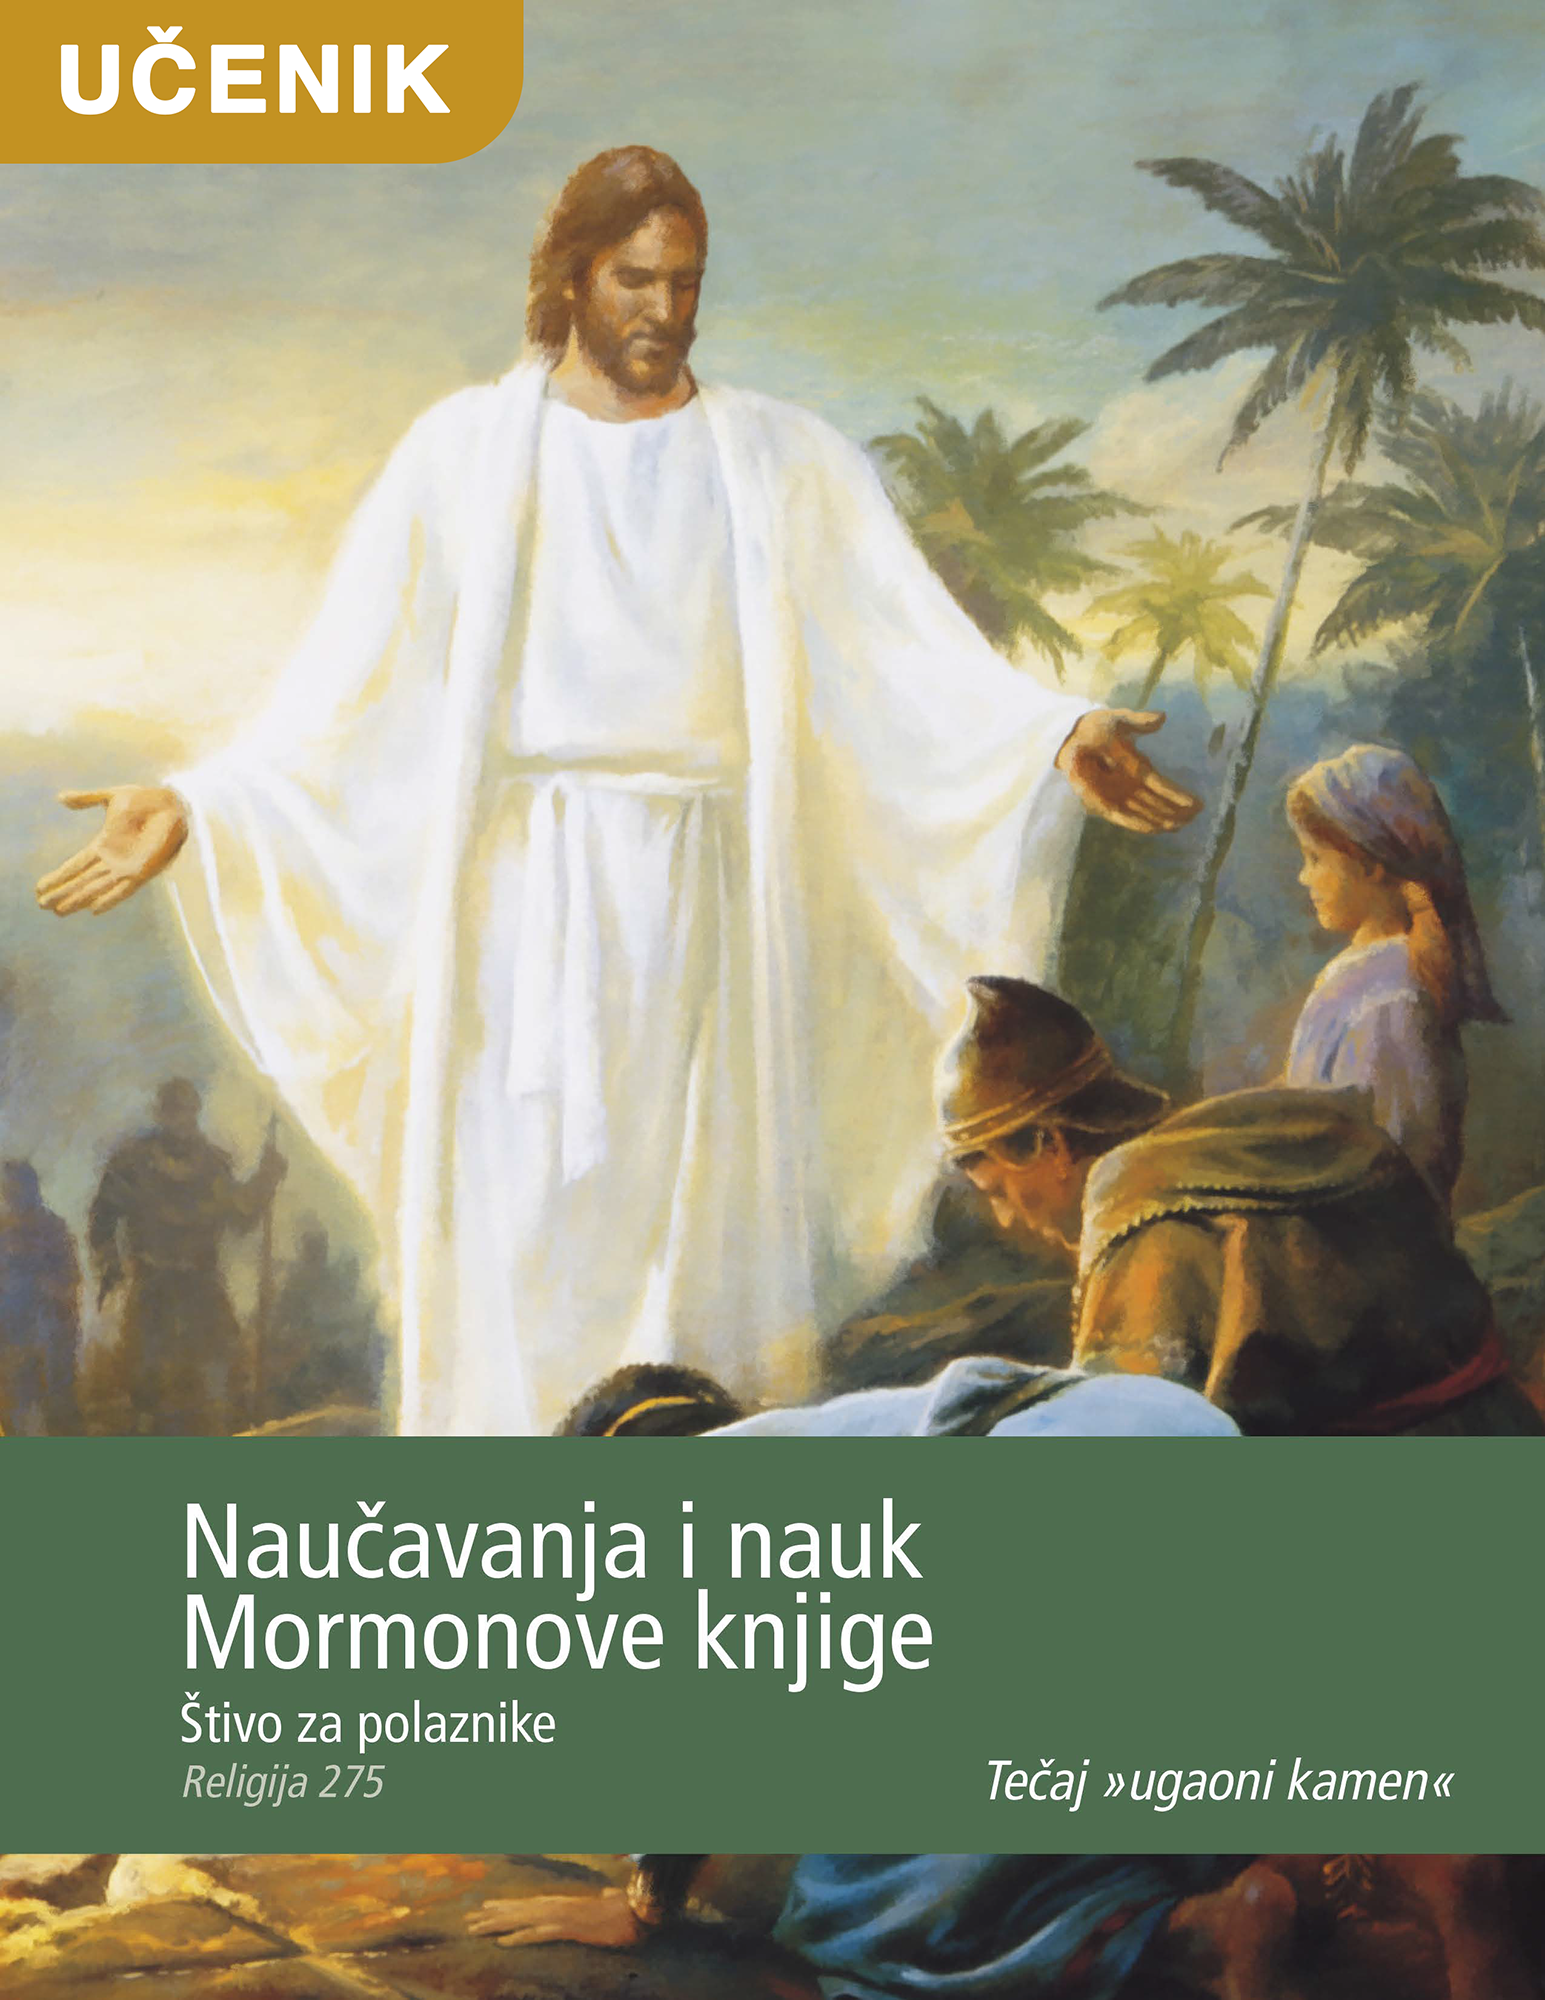 Naučavanja i nauk Mormonove knjige – štivo za polaznike (Rel 275)